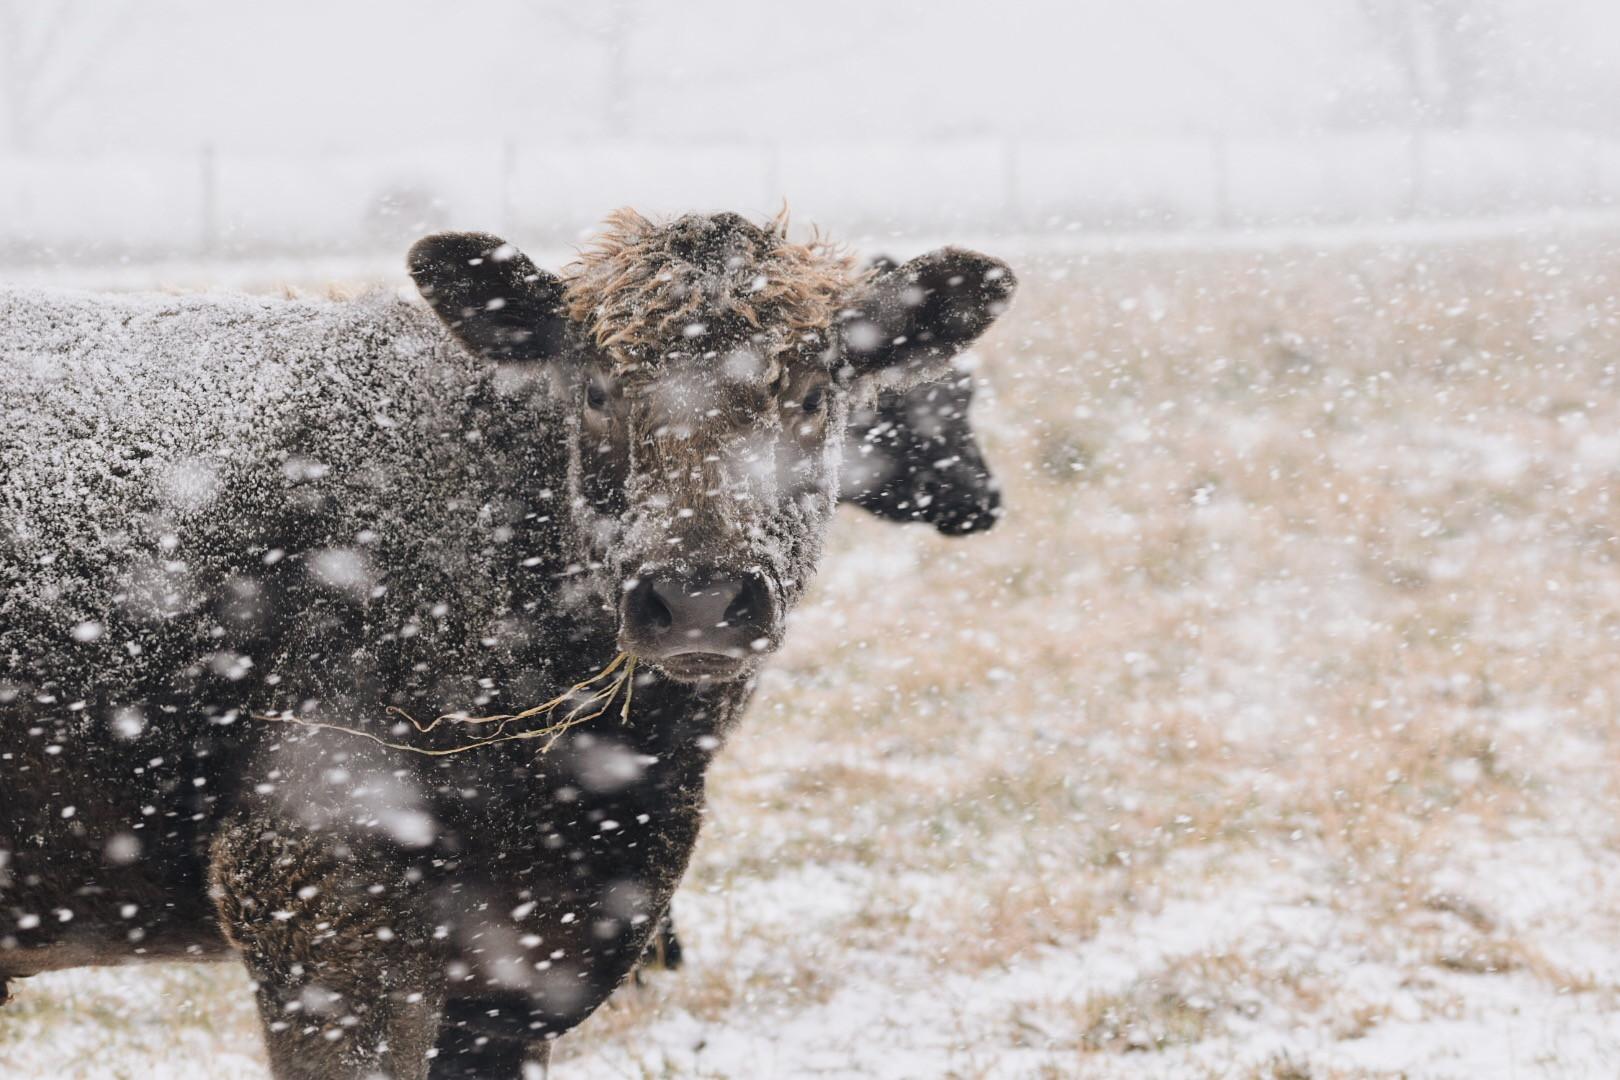 Grassfed Beef